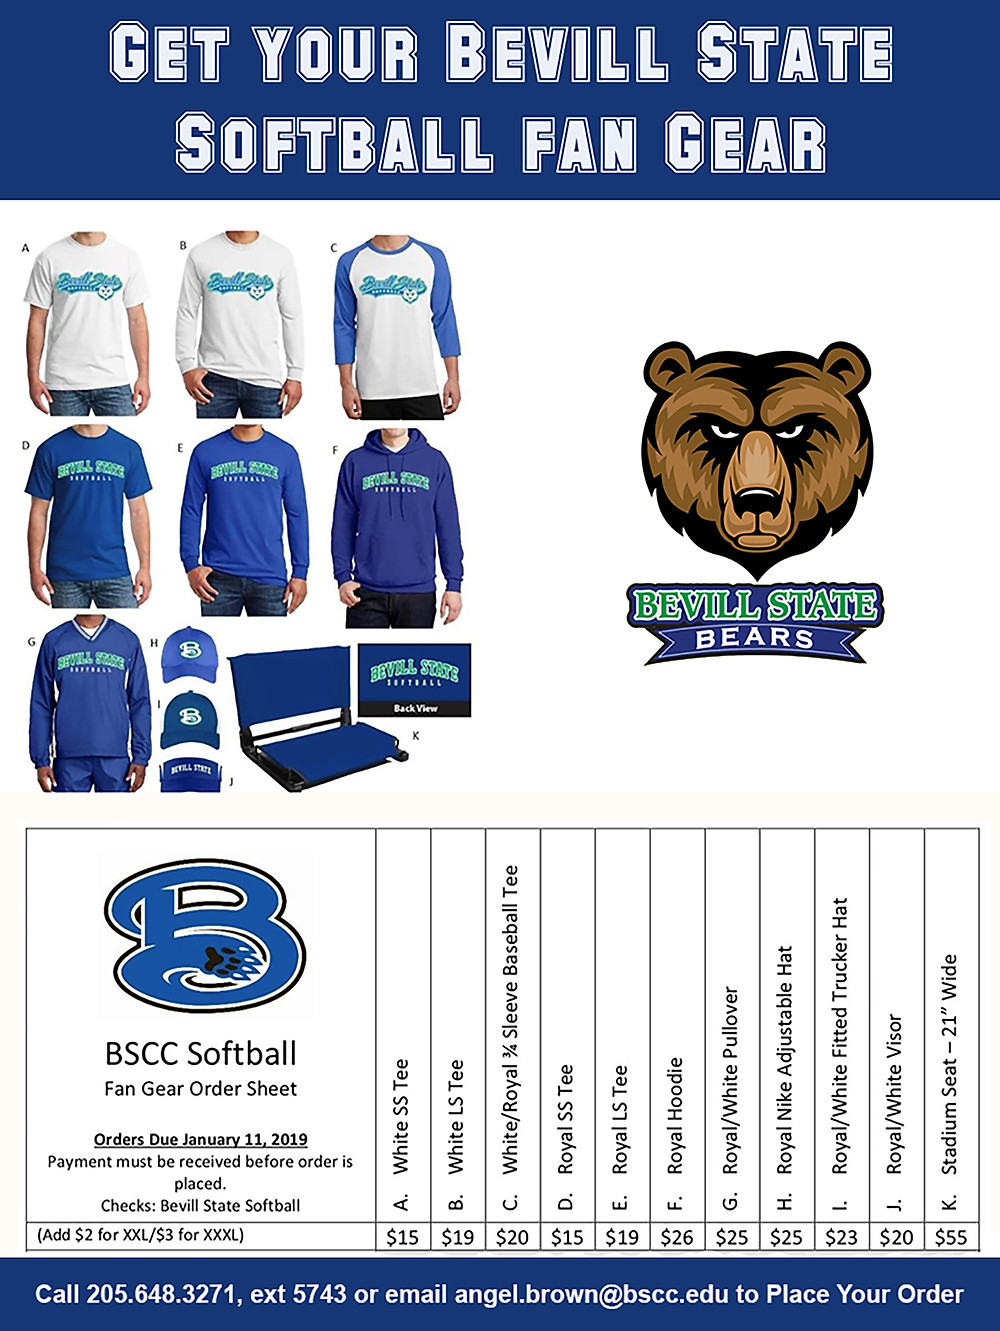 Bevill State Softball Fan Gear Handout